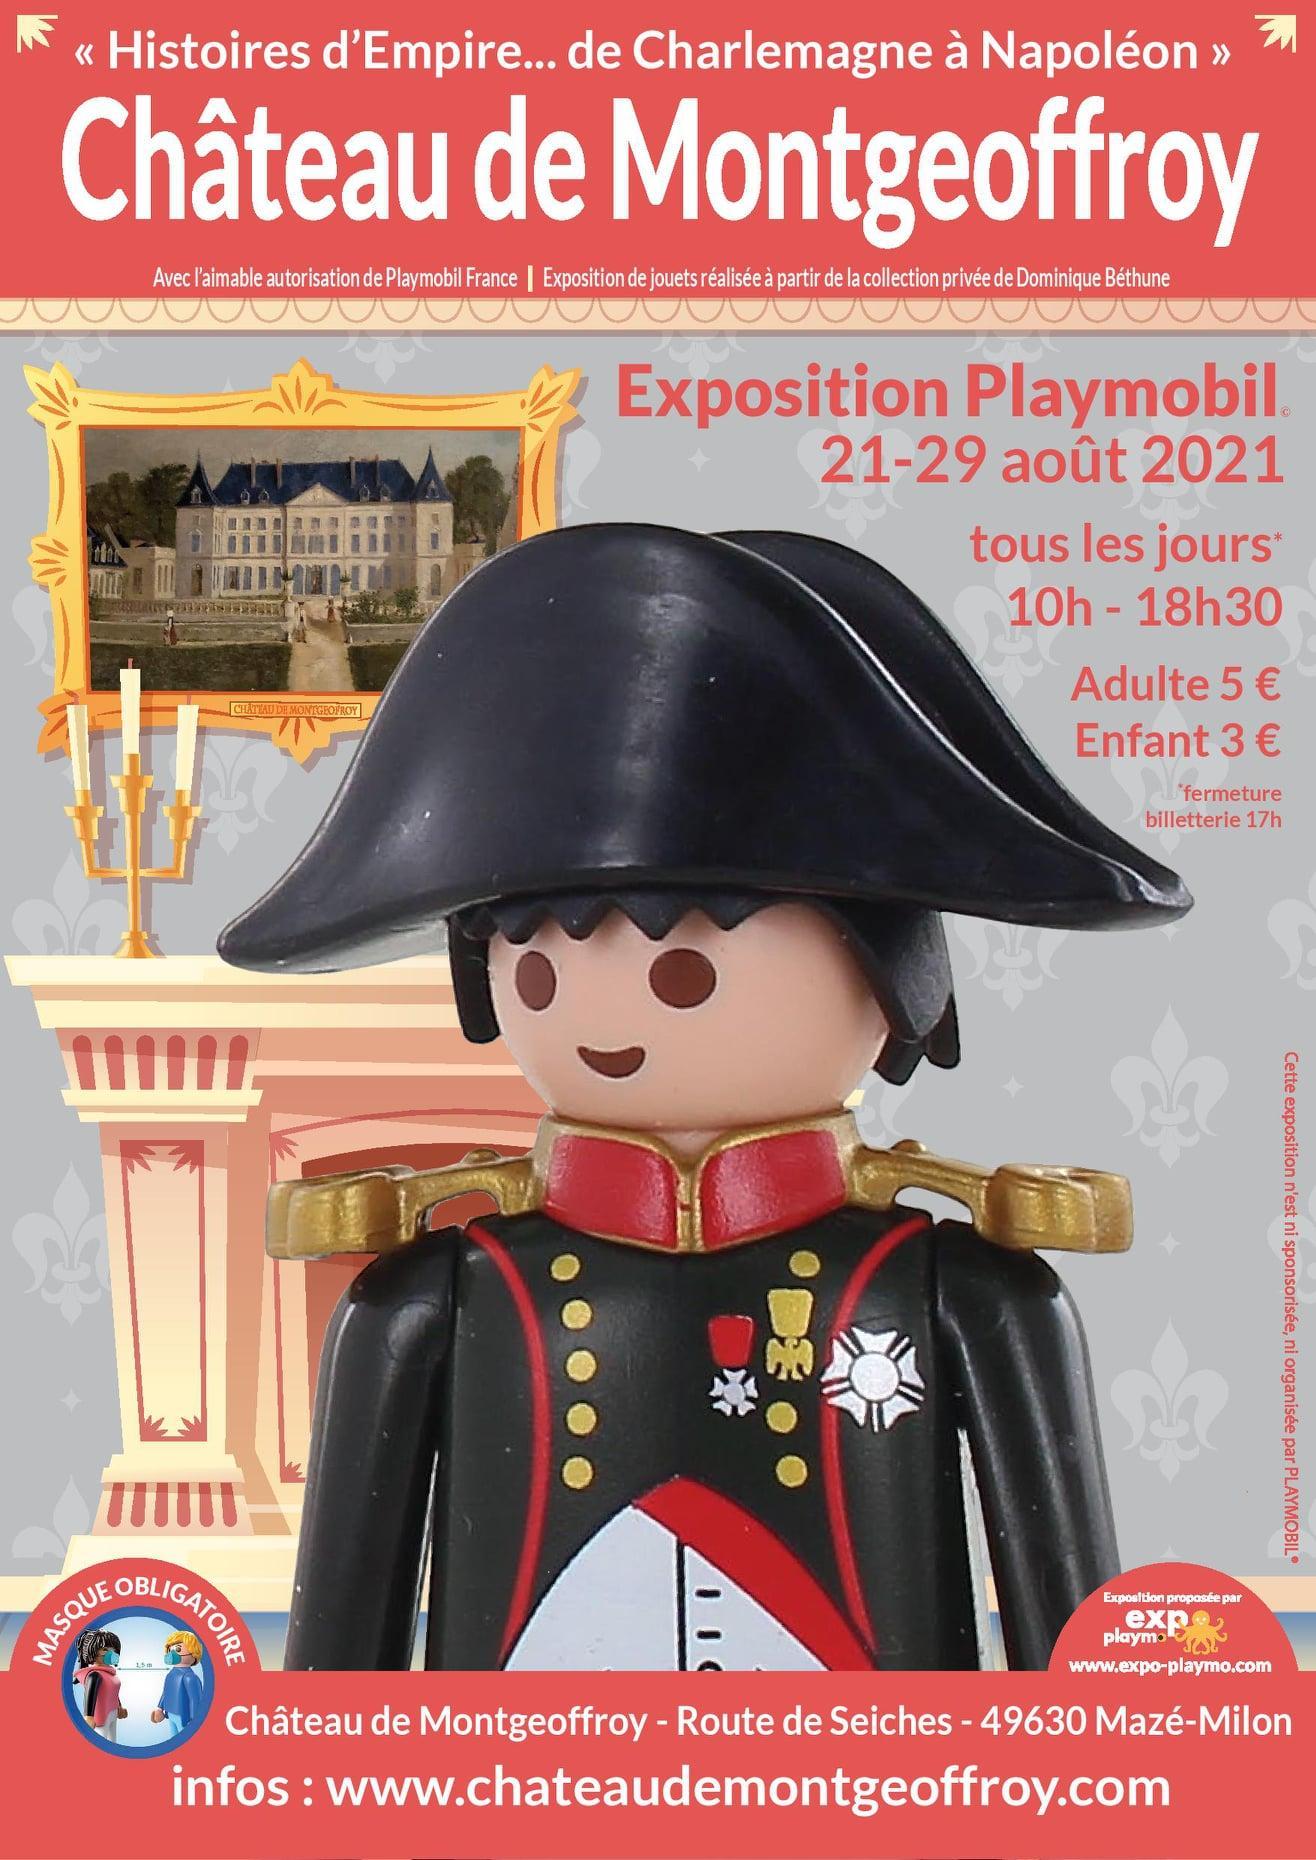 Affiche exposition playmobil chateau montgeoffroy 2021 dominique bethune